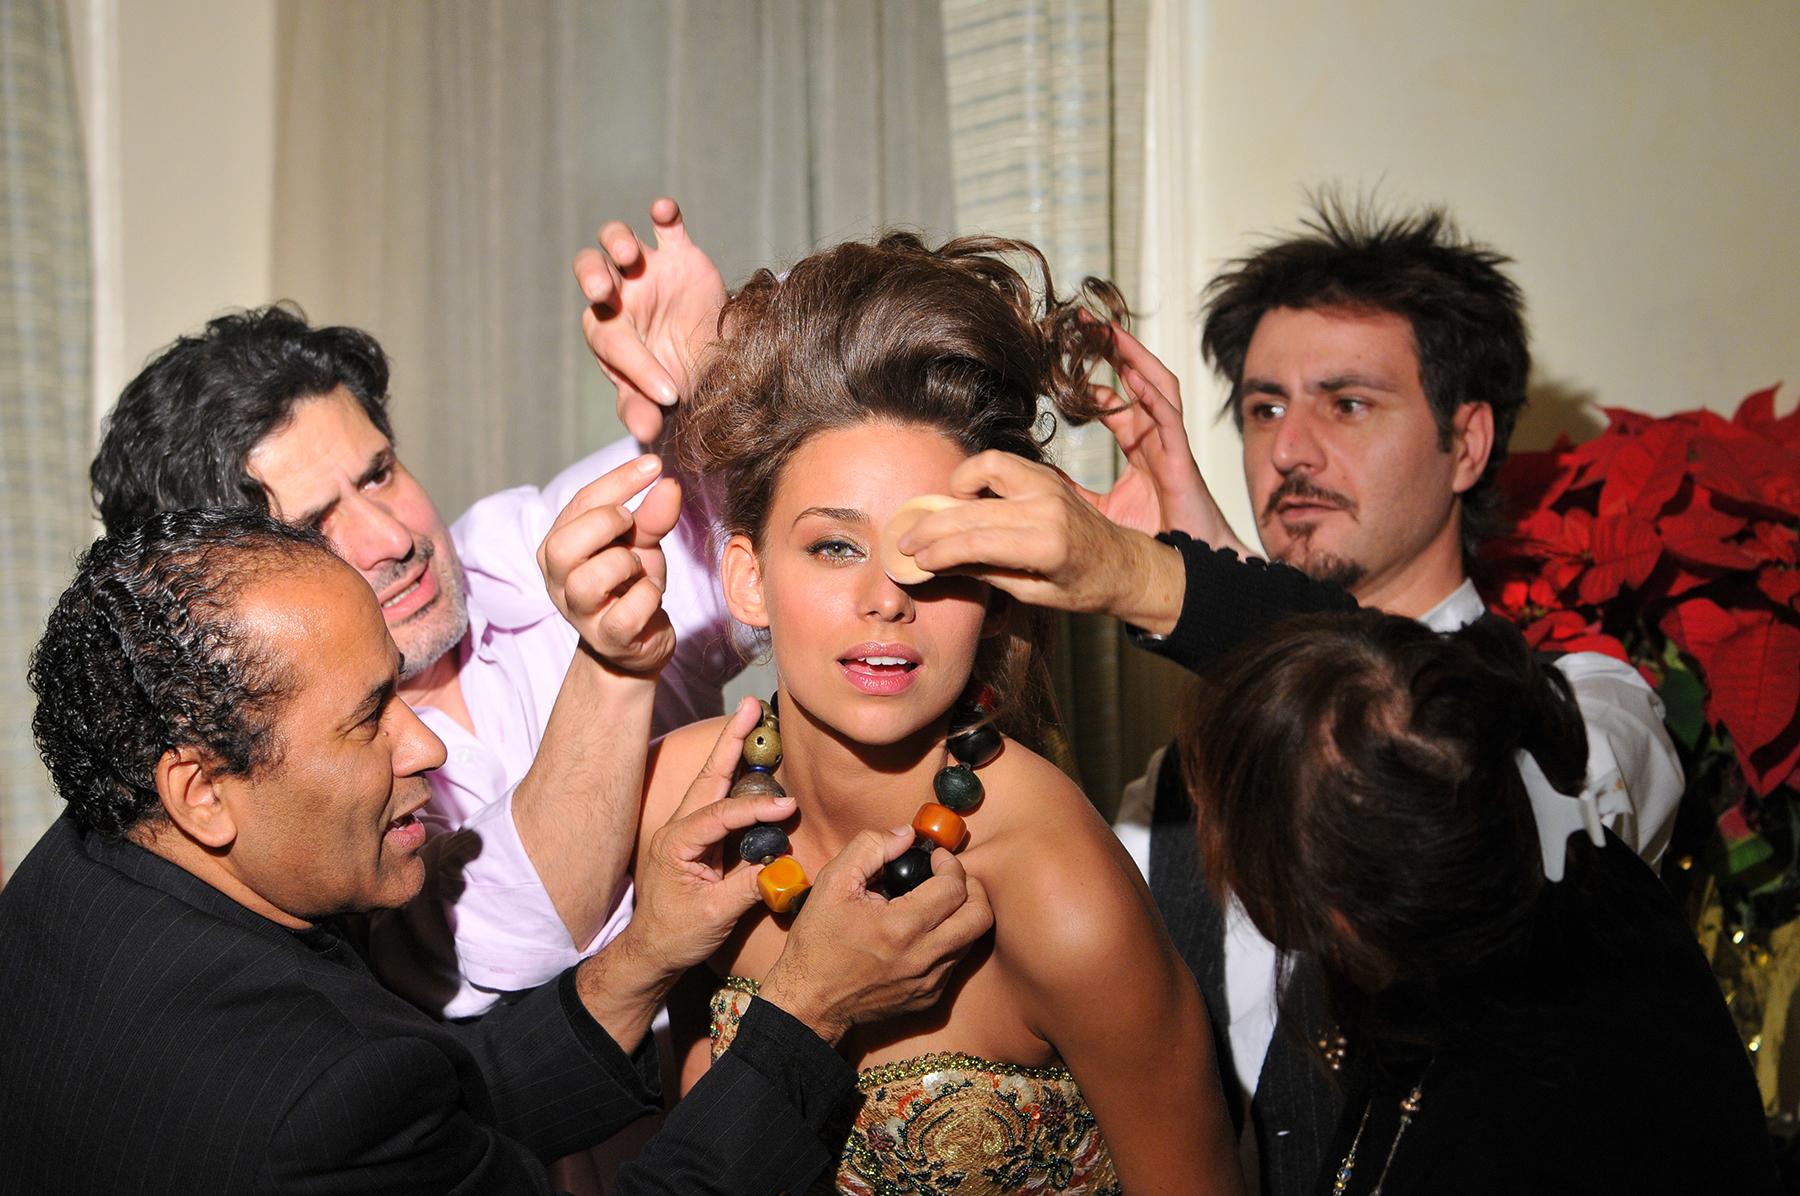 Federico Salon Direct